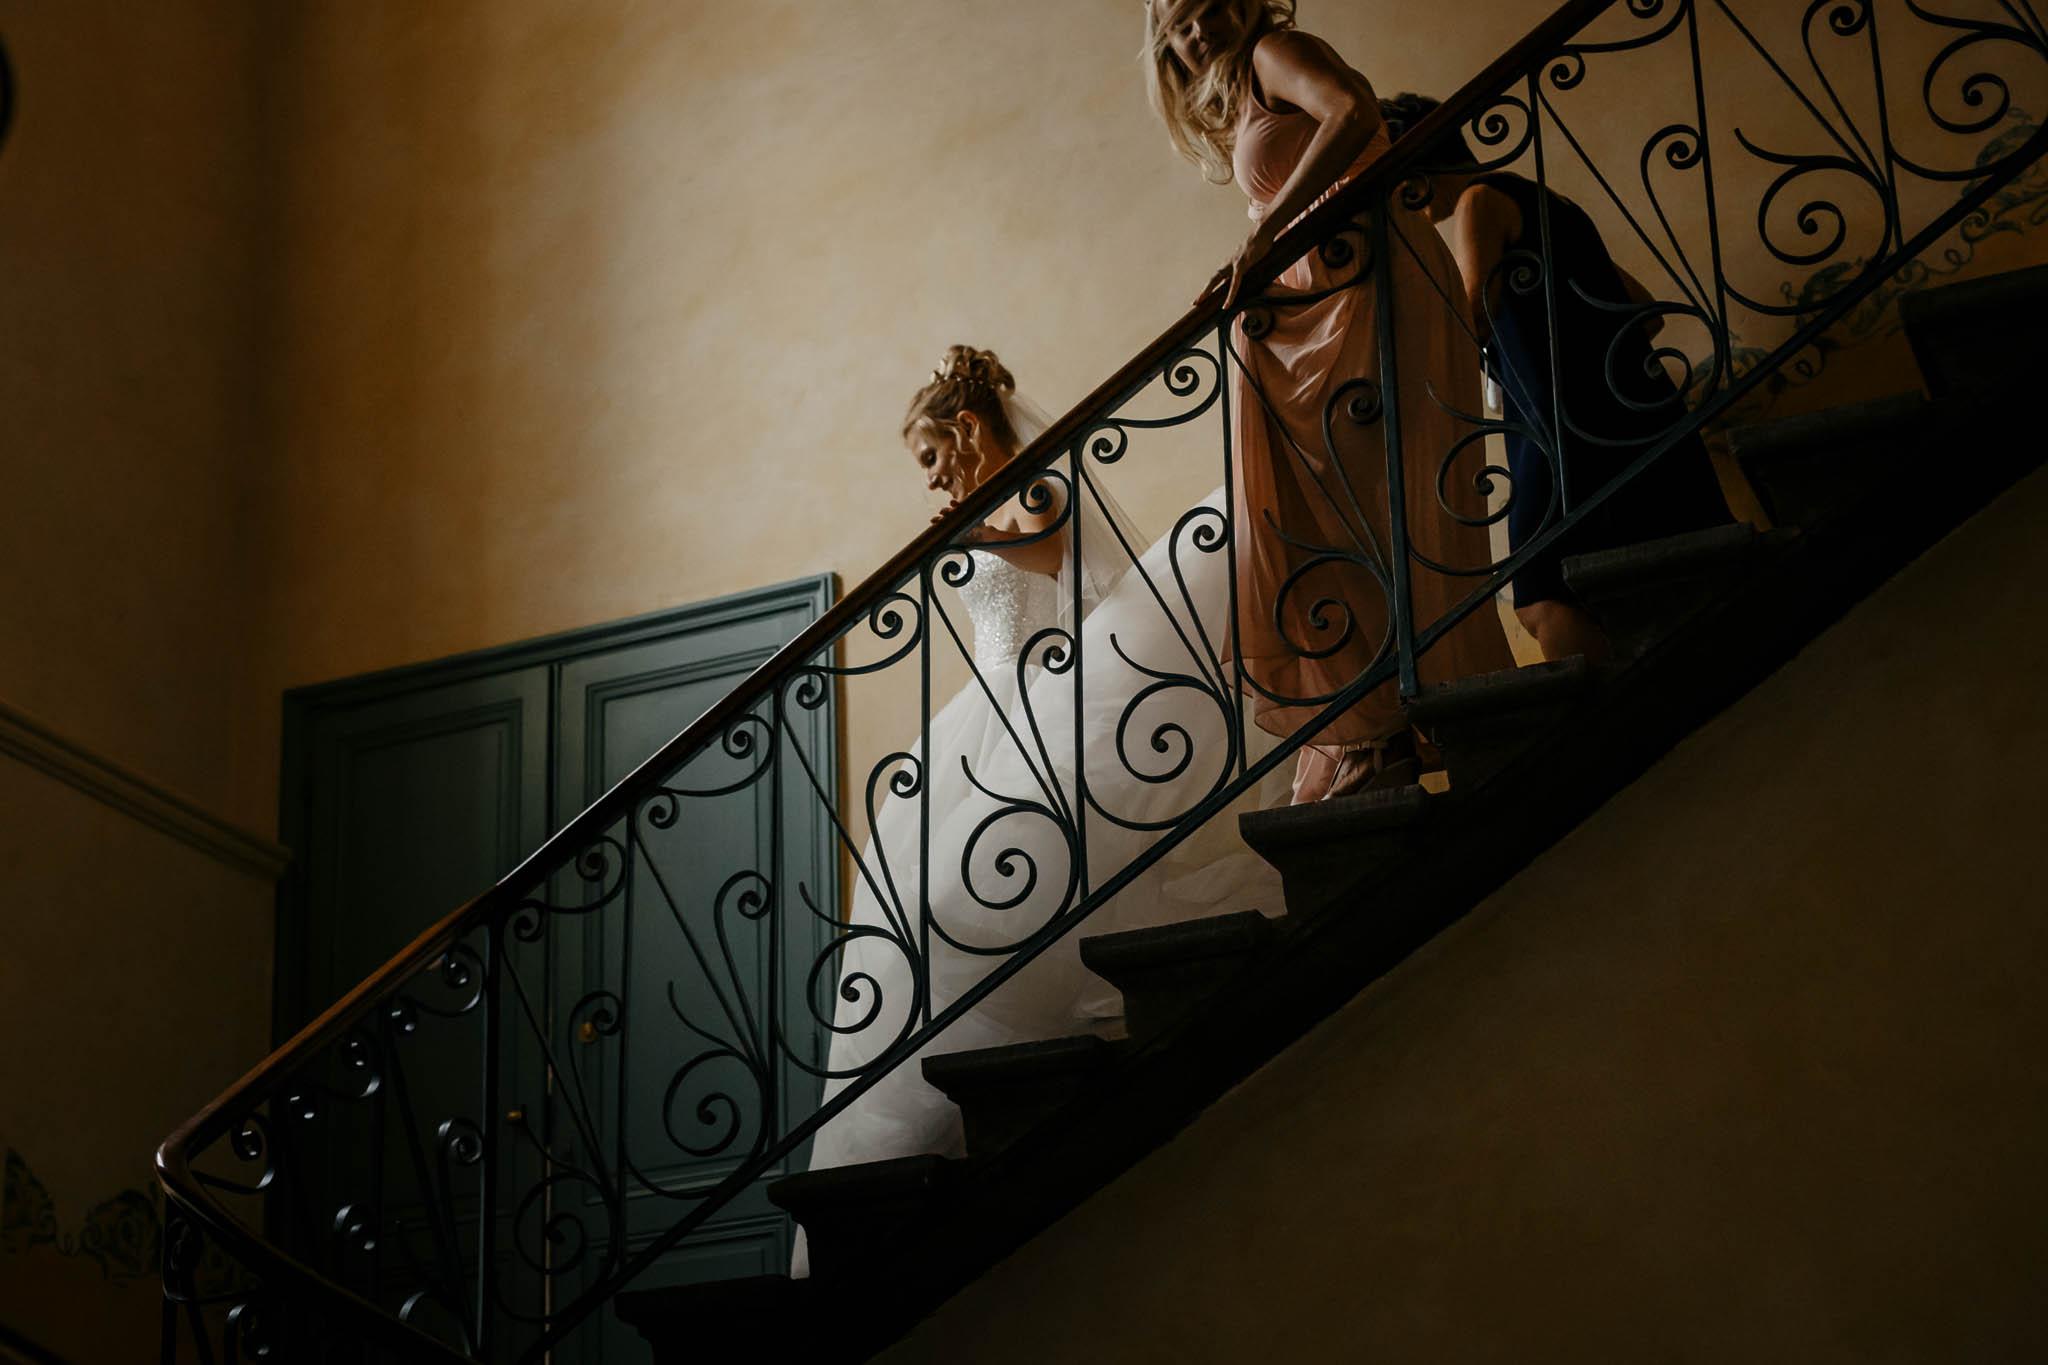 mariage-chateau-gaudras-ingold-23.jpg